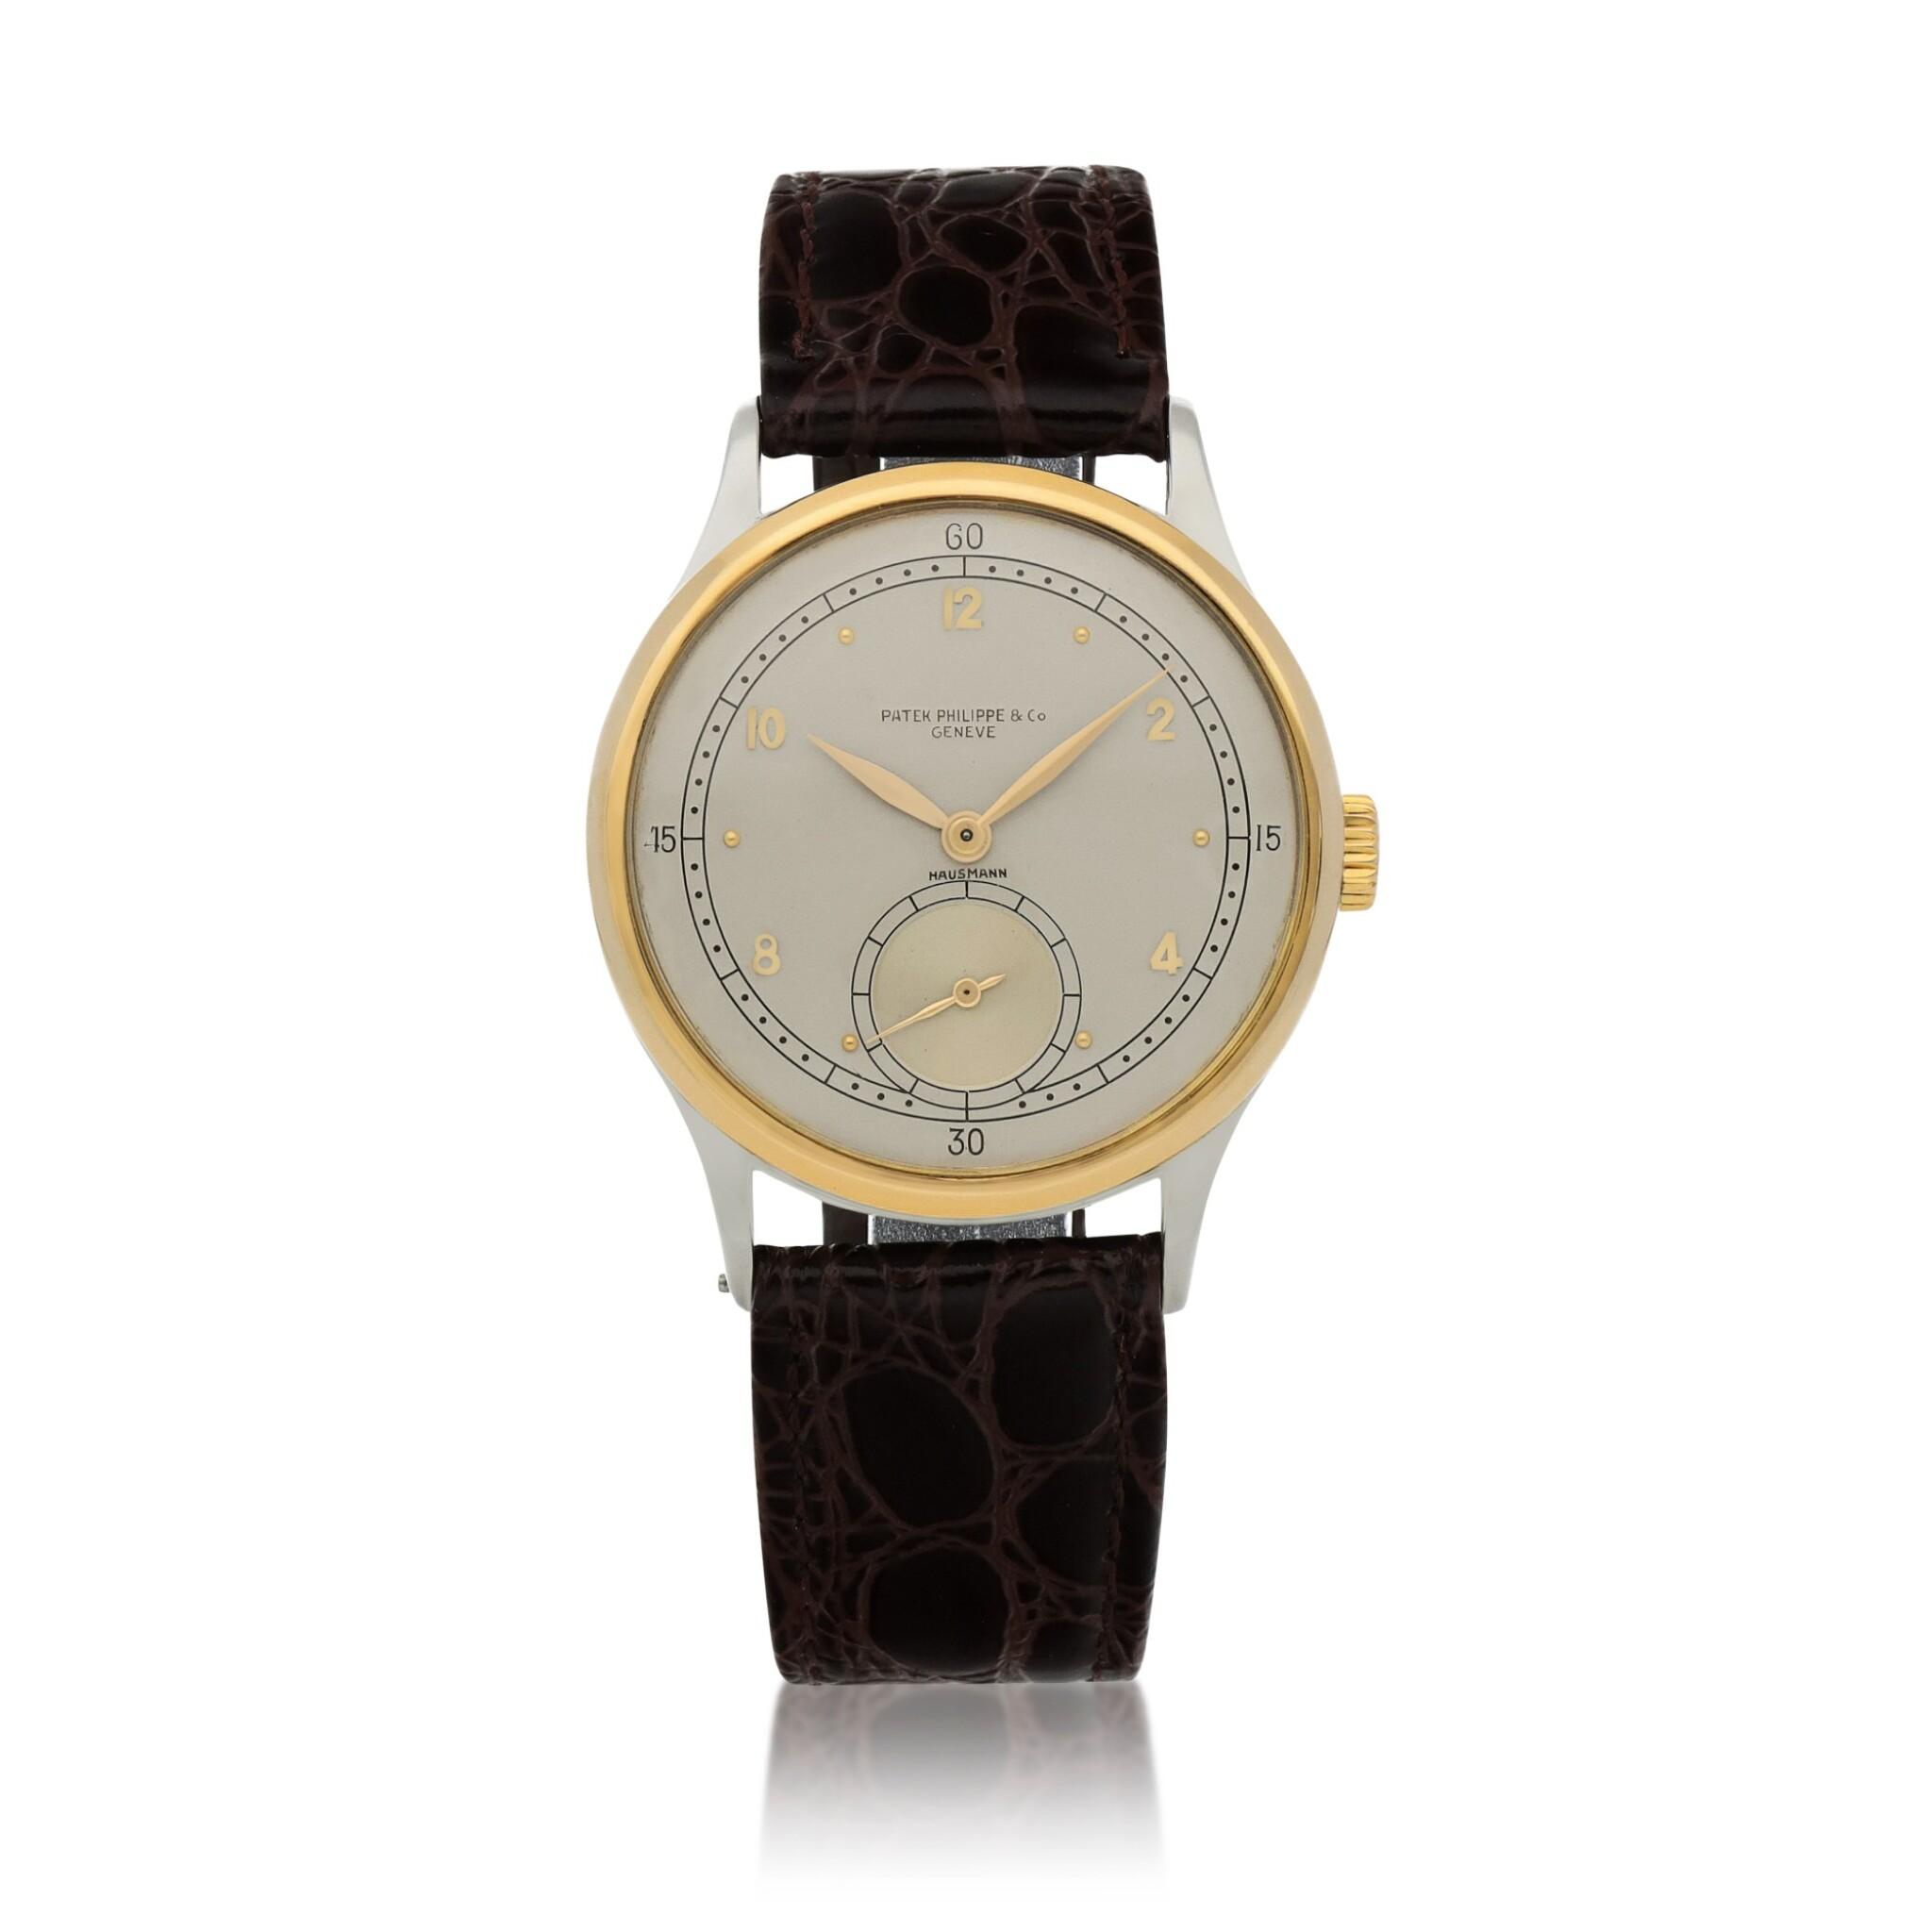 View full screen - View 1 of Lot 52. Retailed by Hausmann: Ref. 530 Stainless steel and yellow gold wristwatch Circa 1942 | 百達翡麗|零售商為Hausmann:530型號精鋼及黃金腕錶,年份約1942.